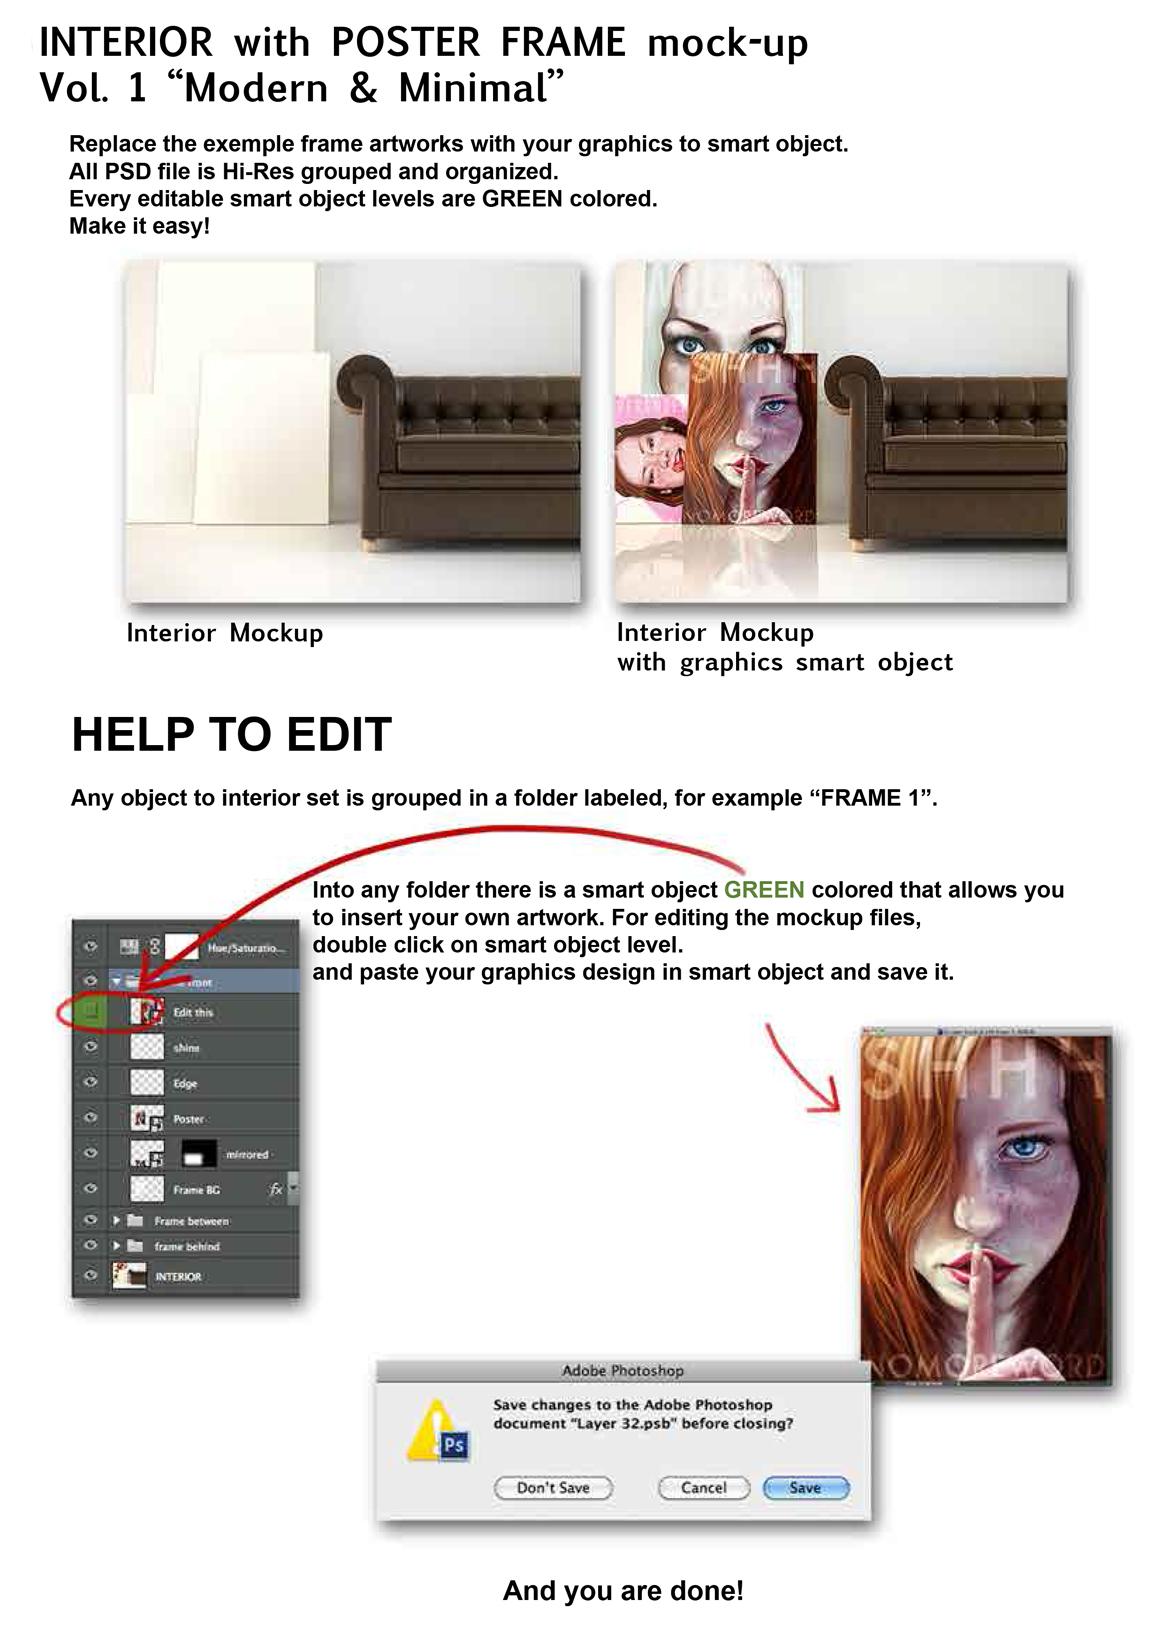 Interiors mockup example image 2